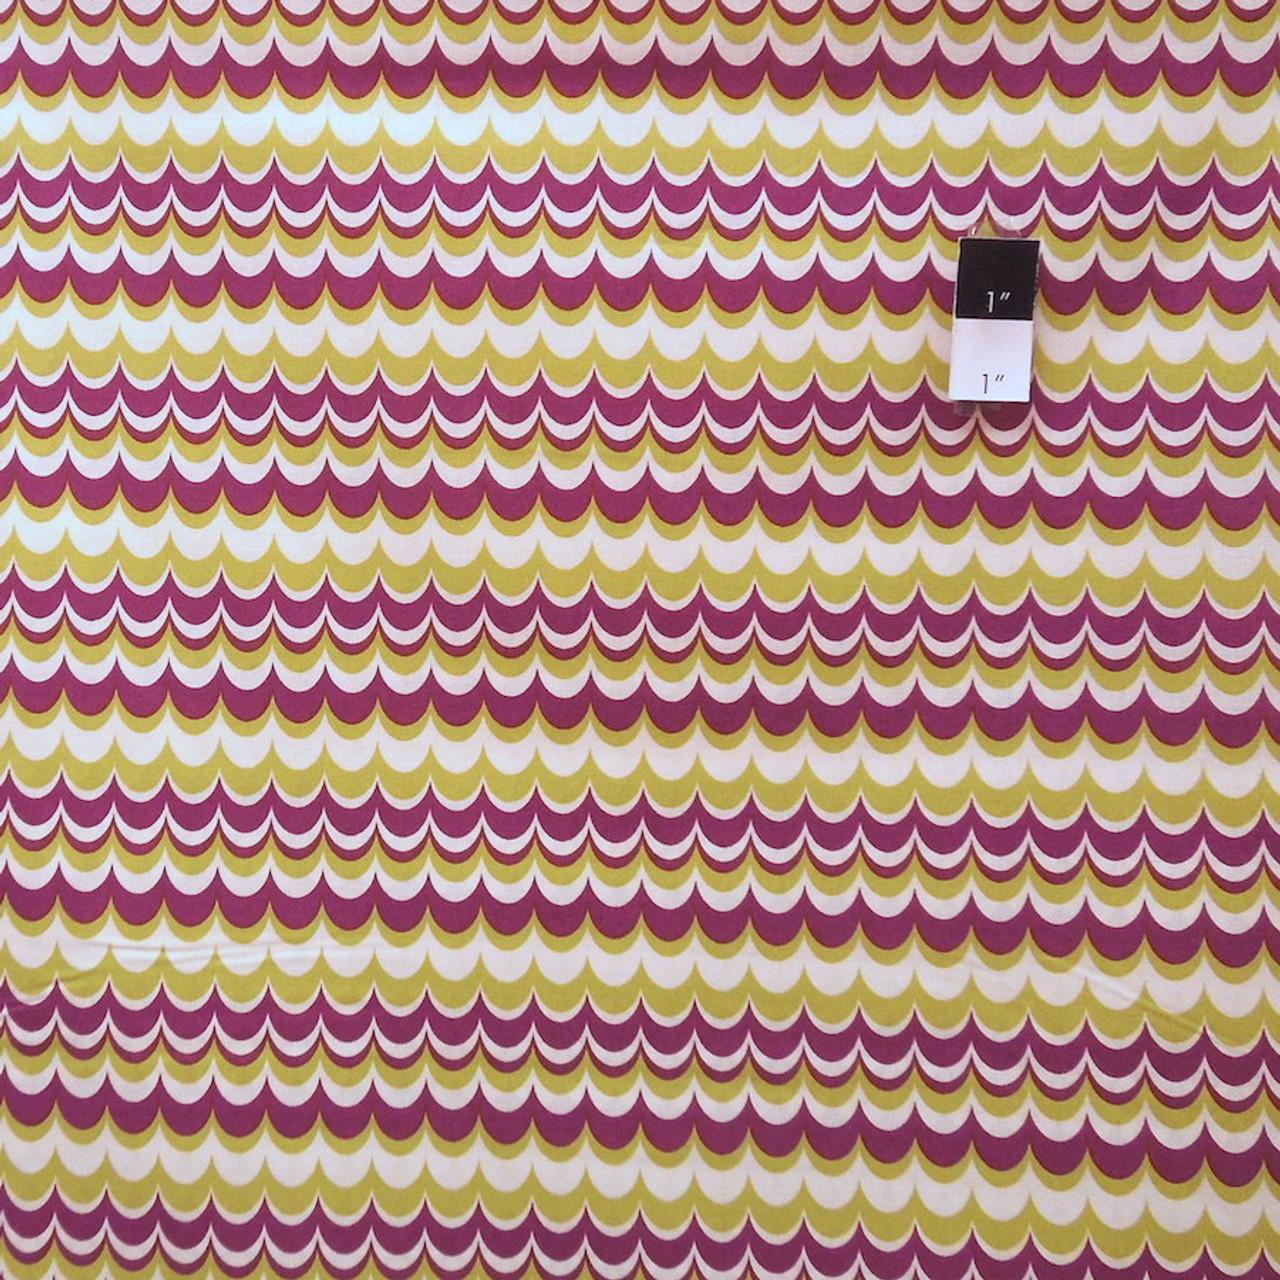 Joel Dewberry JD56 Heirloom Marbled Stripe Gold Cotton Fabric By Yd